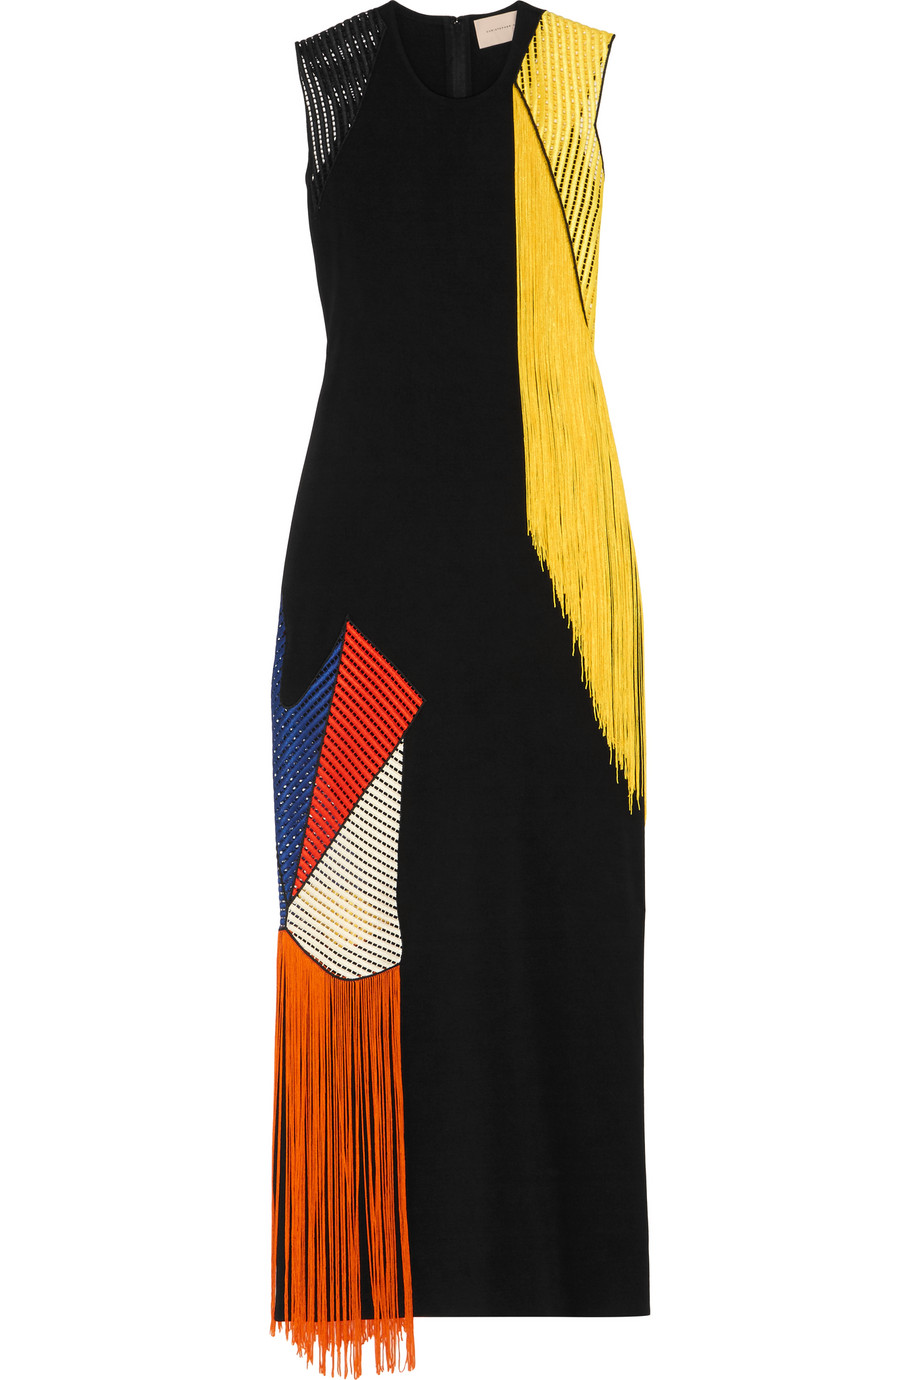 Fringed Crochet-Paneled Stretch-Crepe Maxi Dress, Christopher Kane, Black, Women's, Size: 10